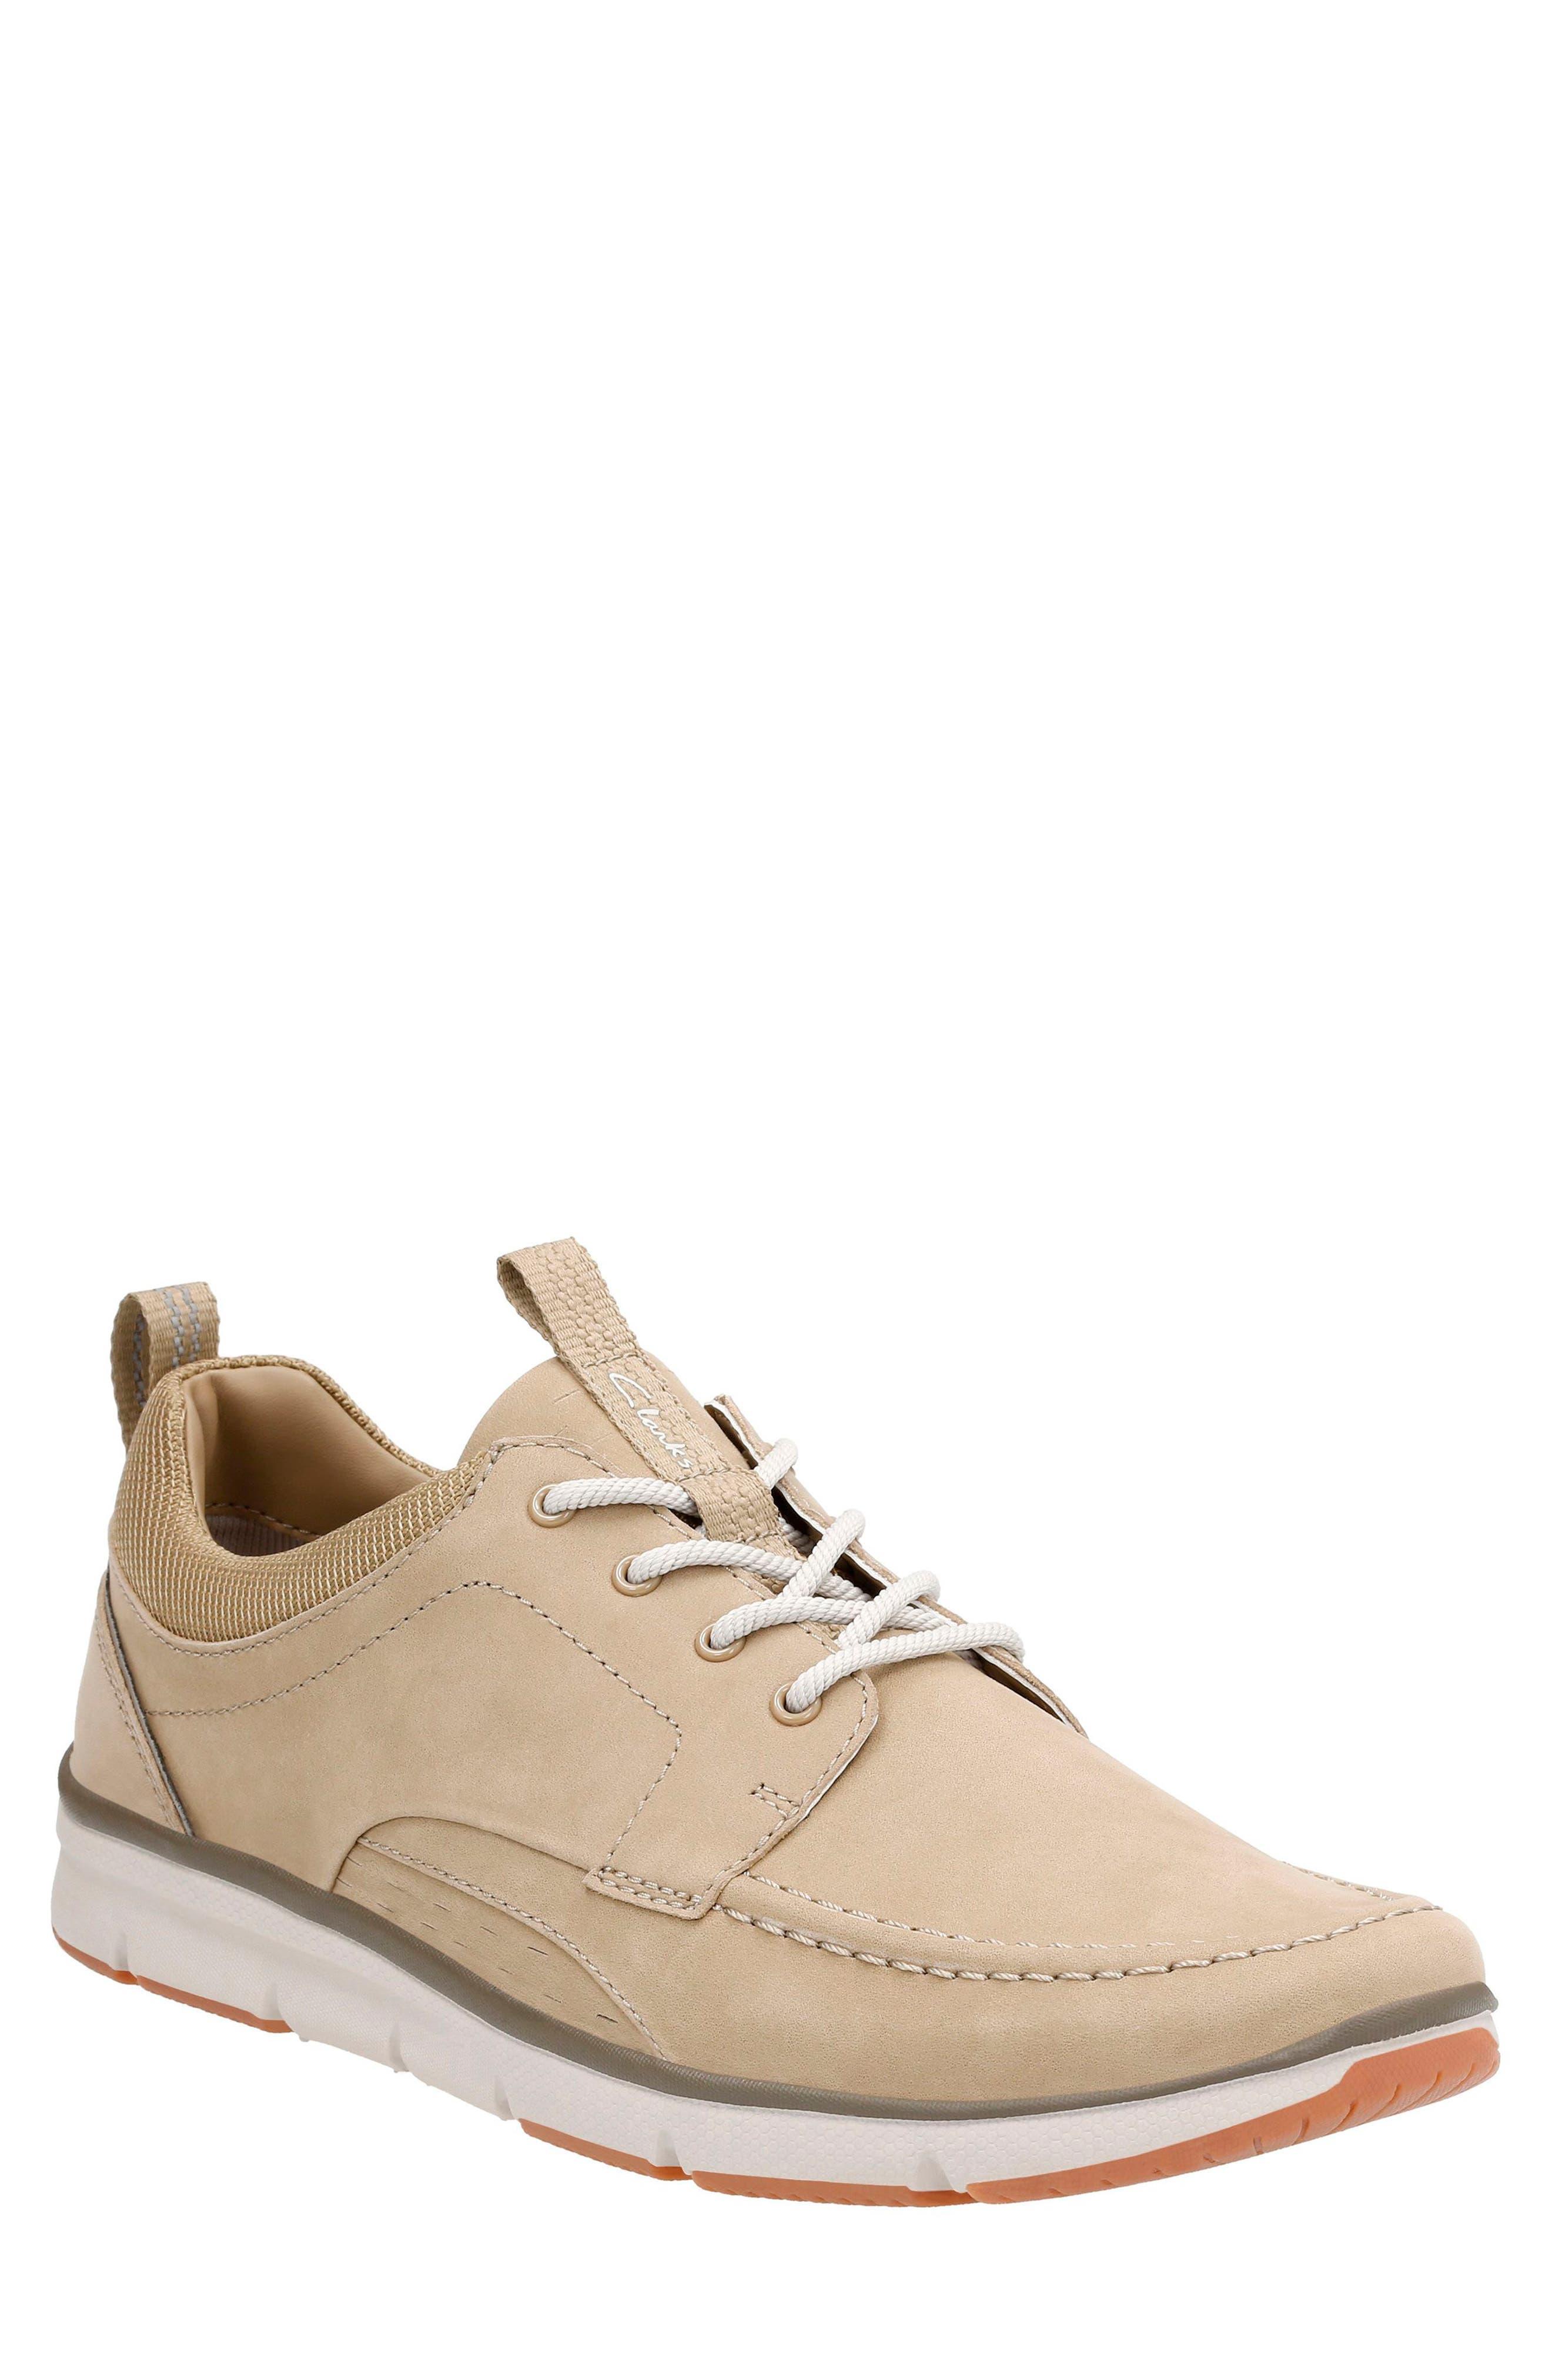 Orson Bay Sneaker, Main, color, 200